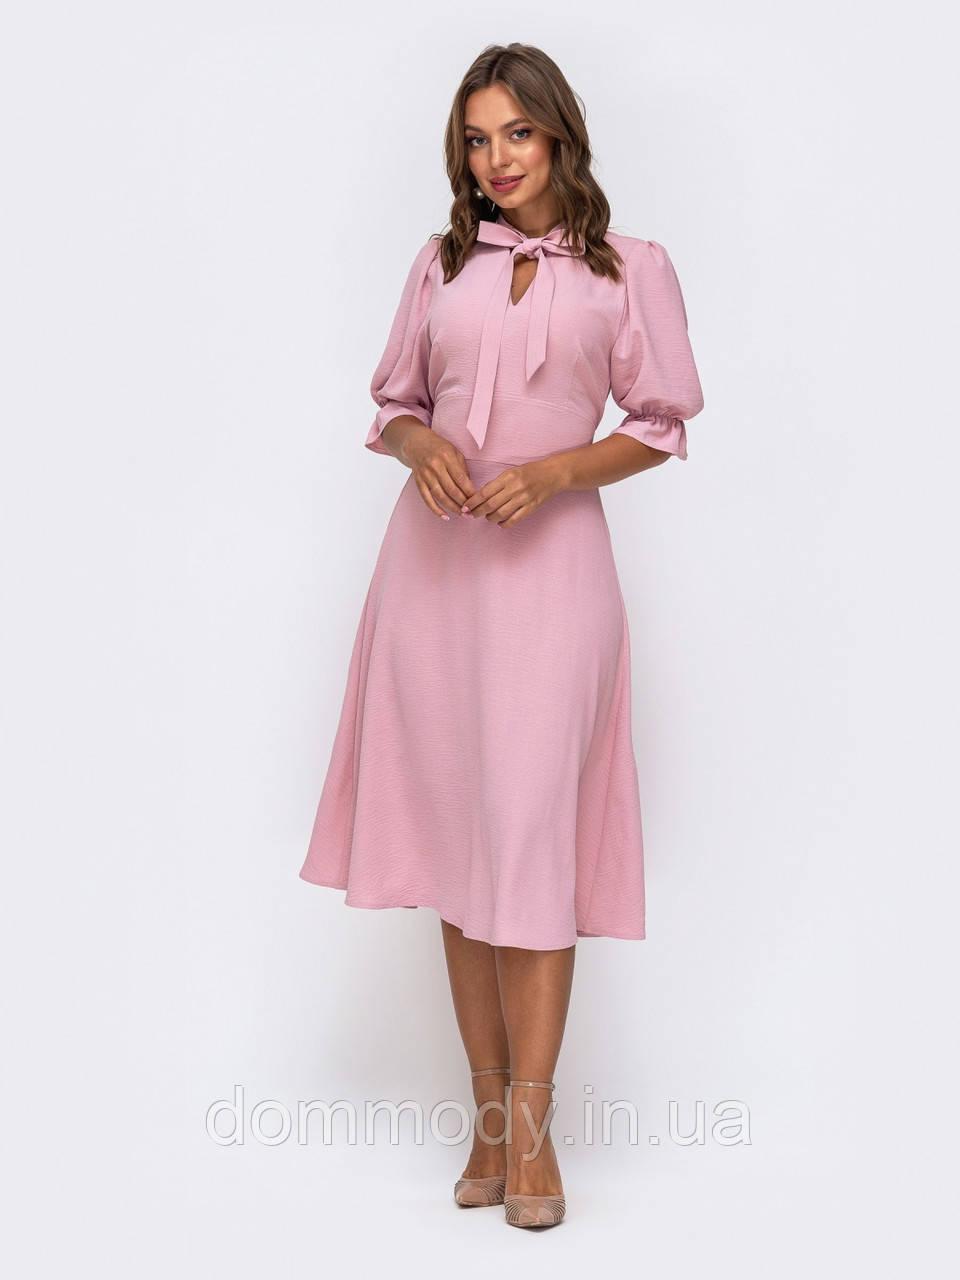 Платье женское Victoria pink